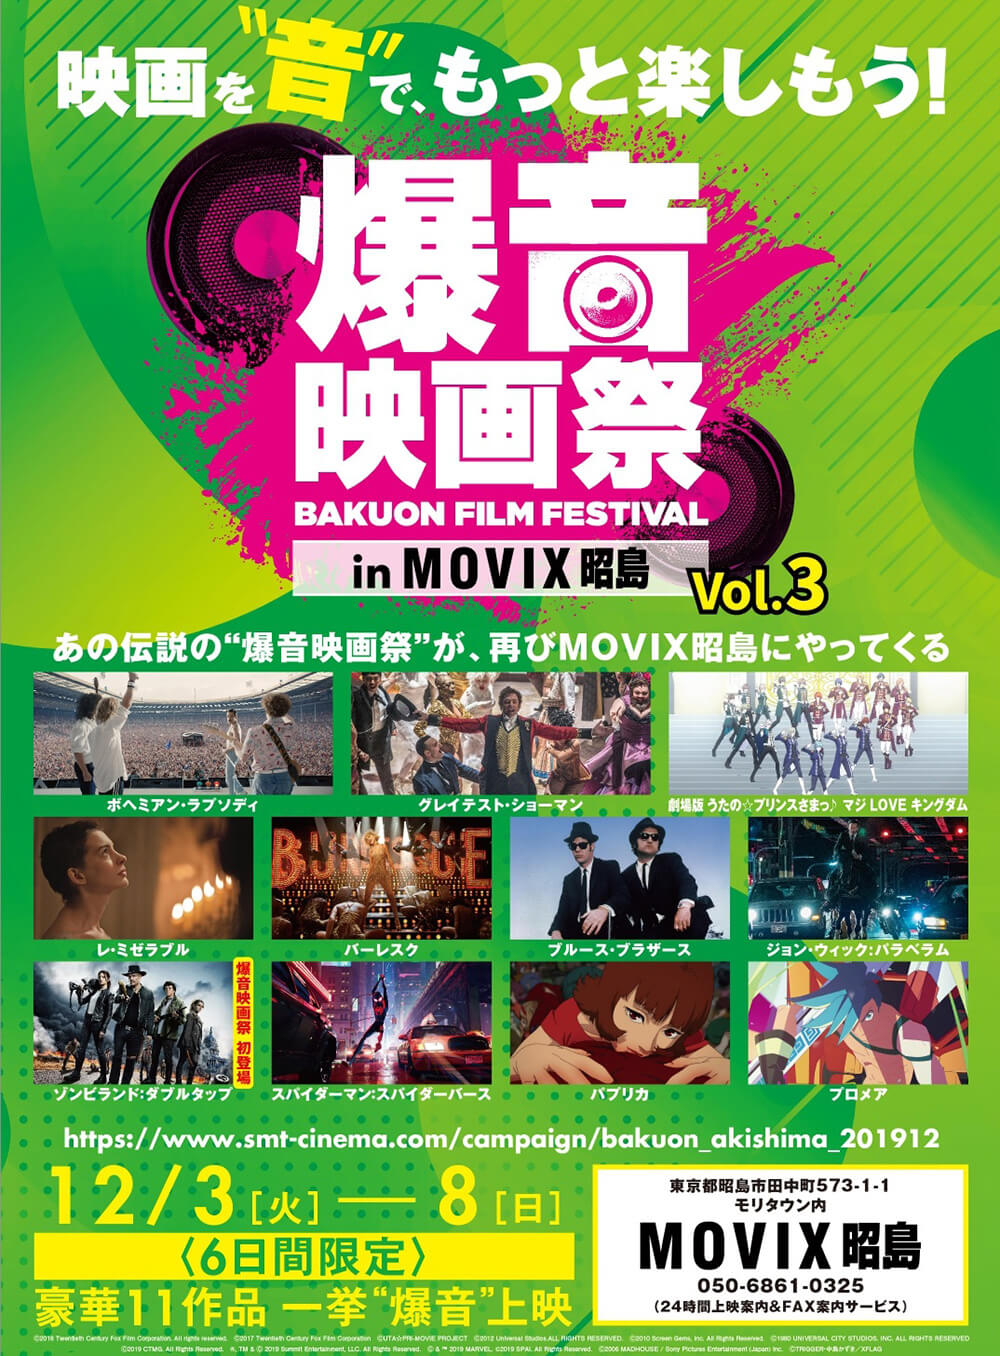 MOVIX 爆音映画祭にて爆音上映決定!